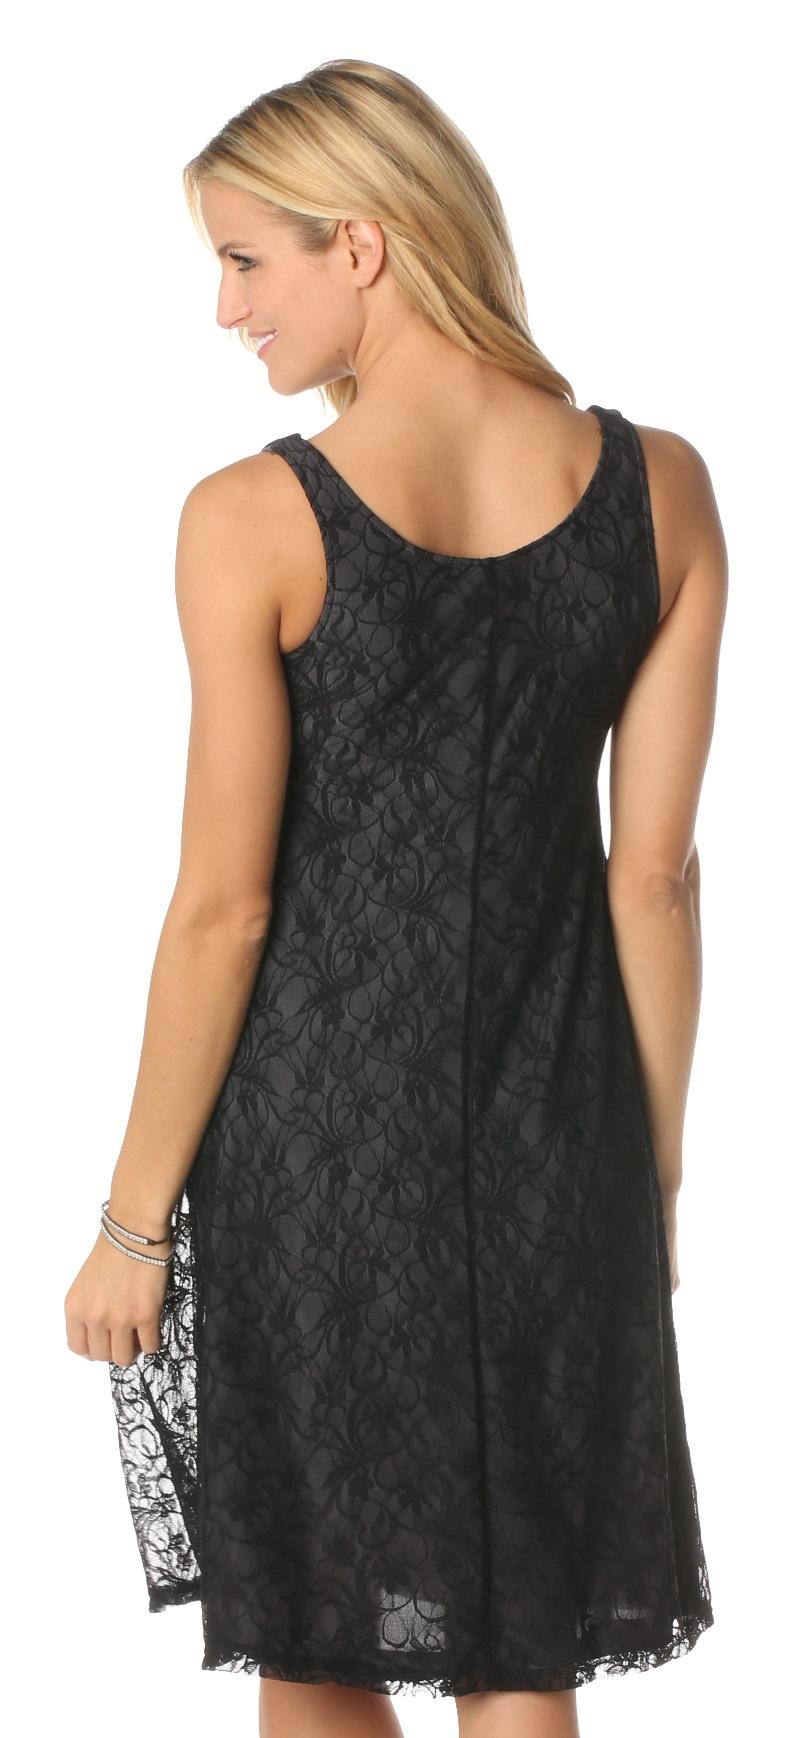 majamas-market-nursing-dress-blacklace-back-close.jpg